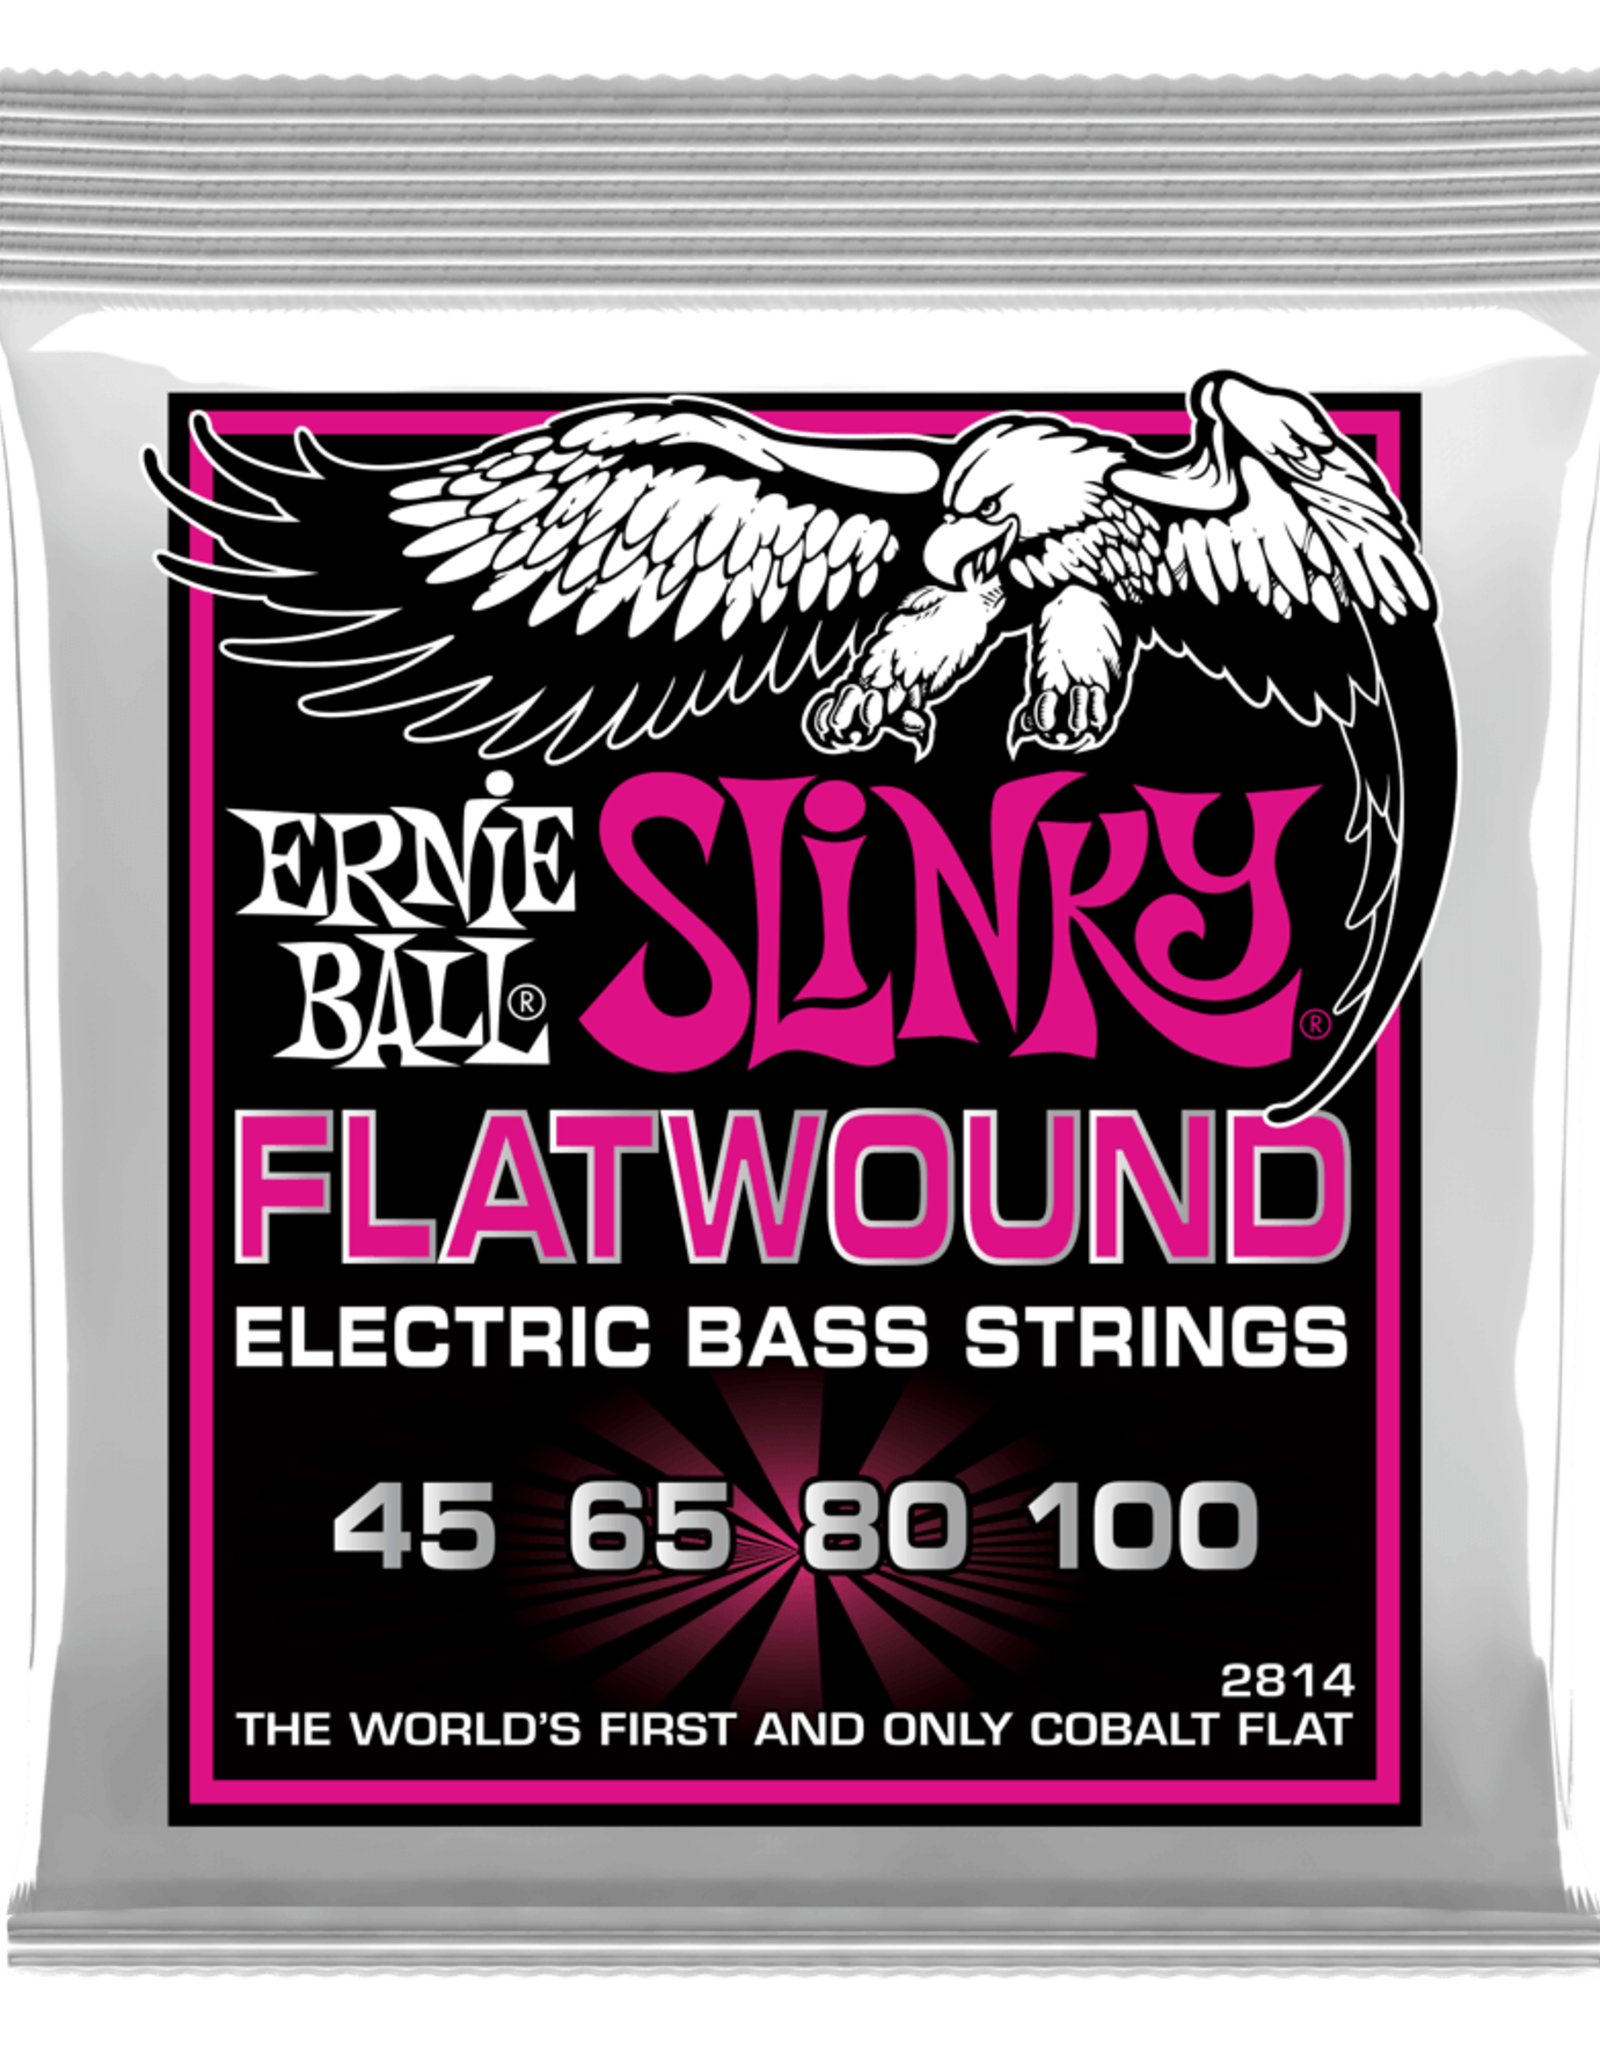 Ernie Ball Super Slinky Flatwound Electric Bass Strings, 45-100